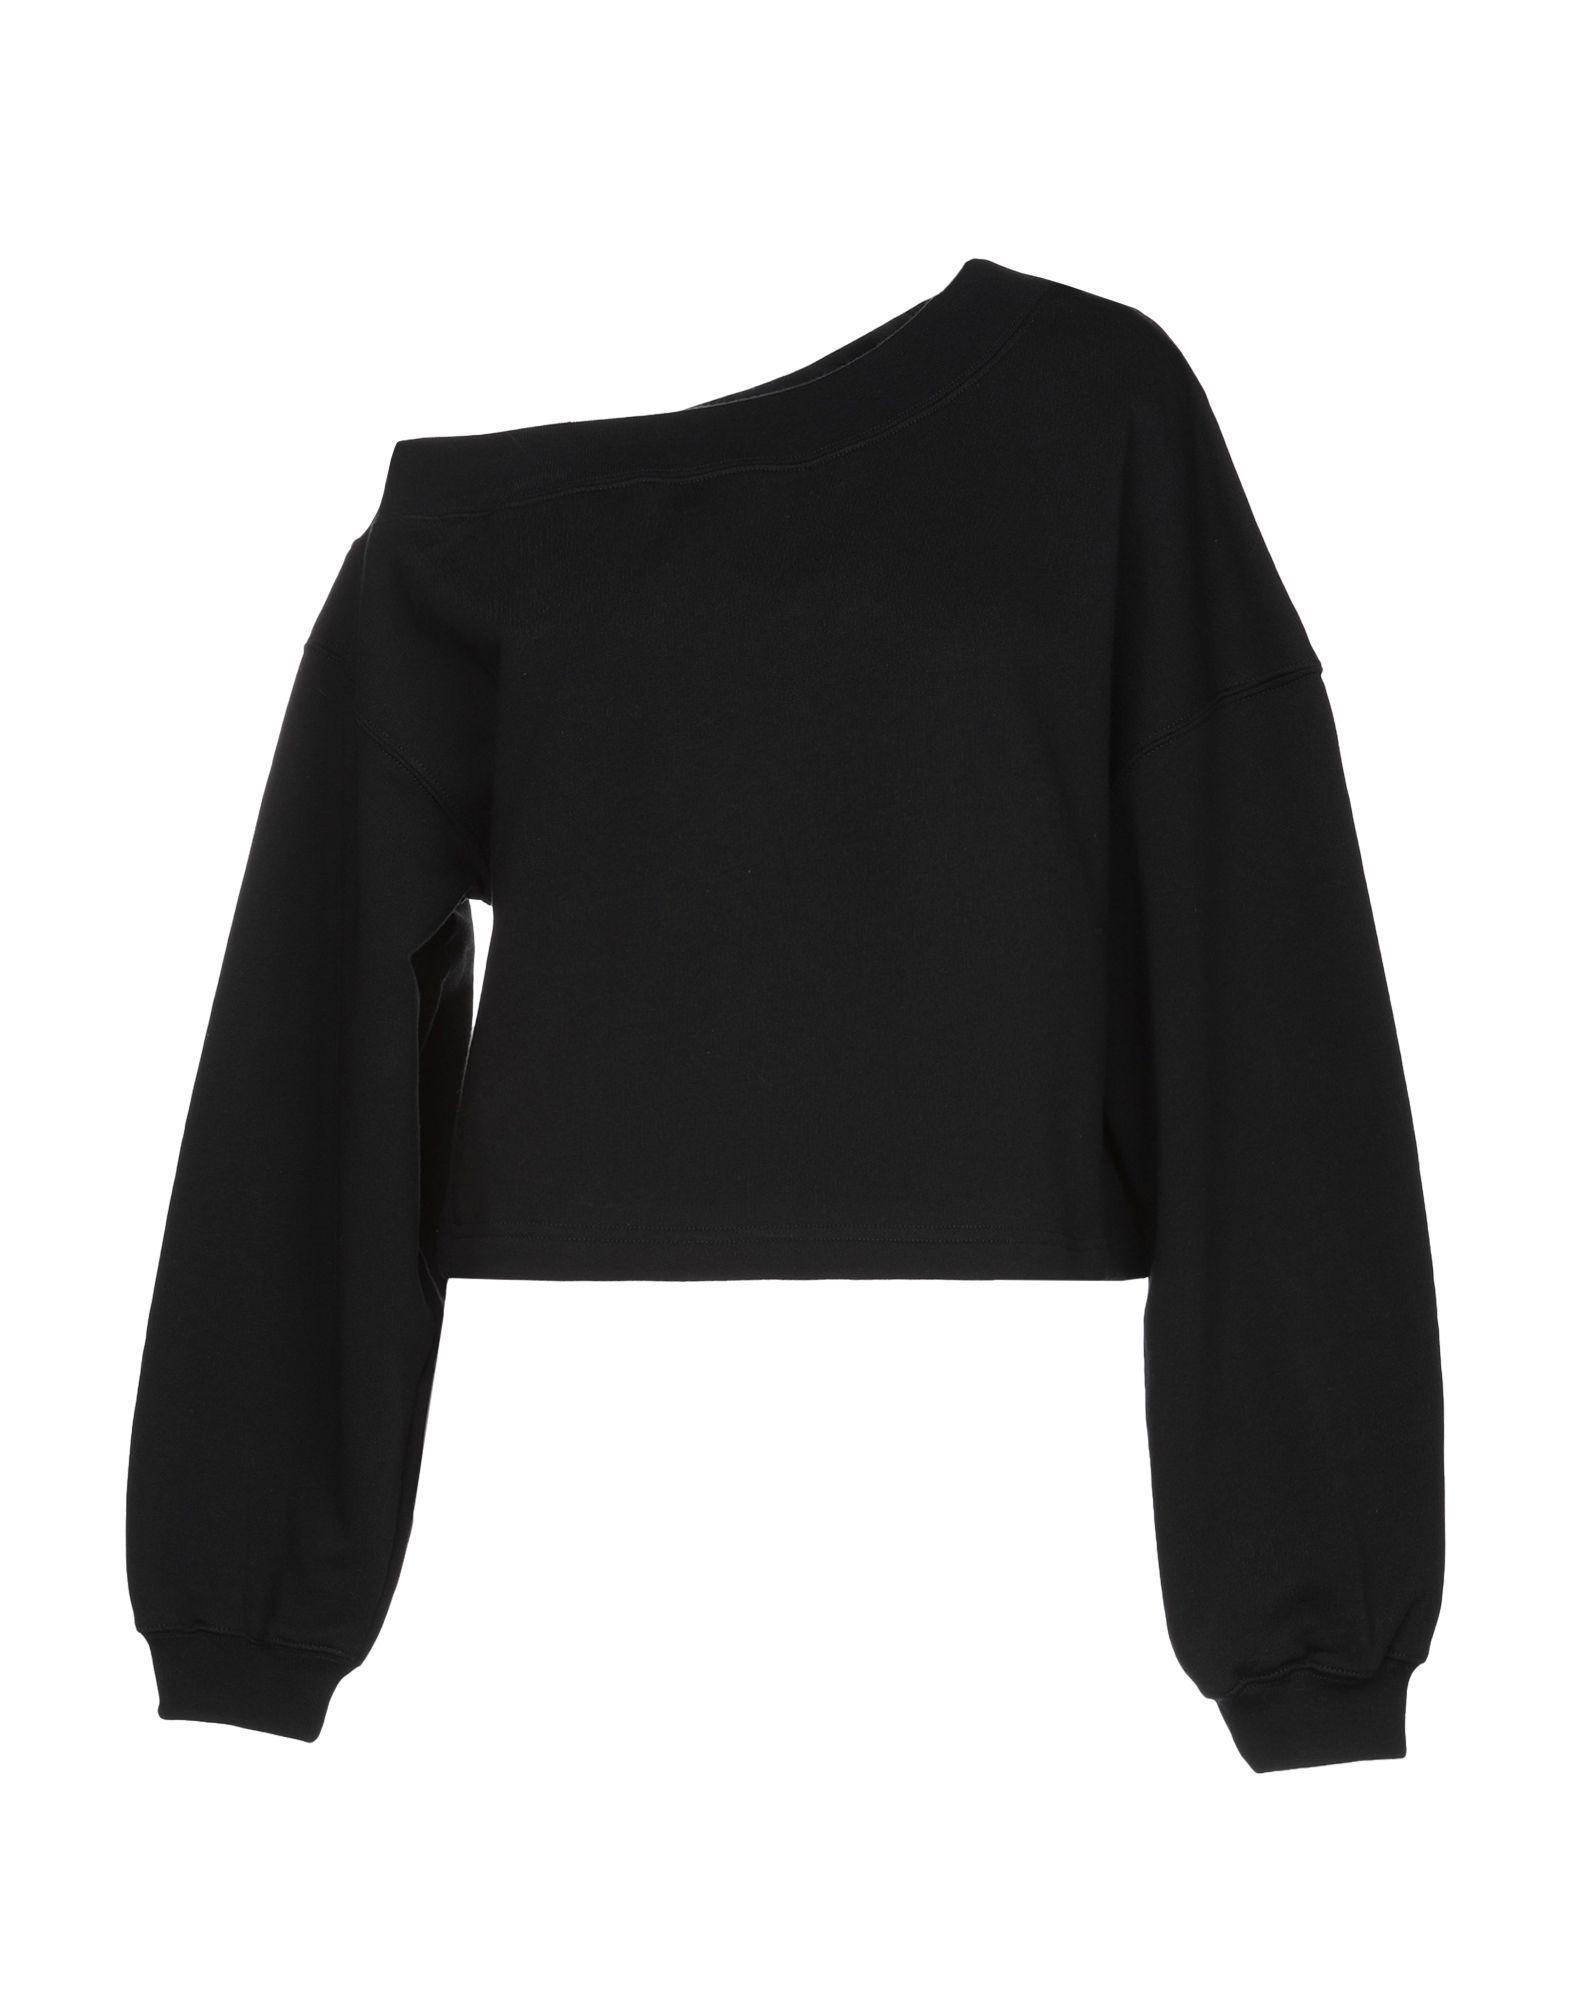 84bc7bd136 Msgm Sweatshirt in Black - Lyst